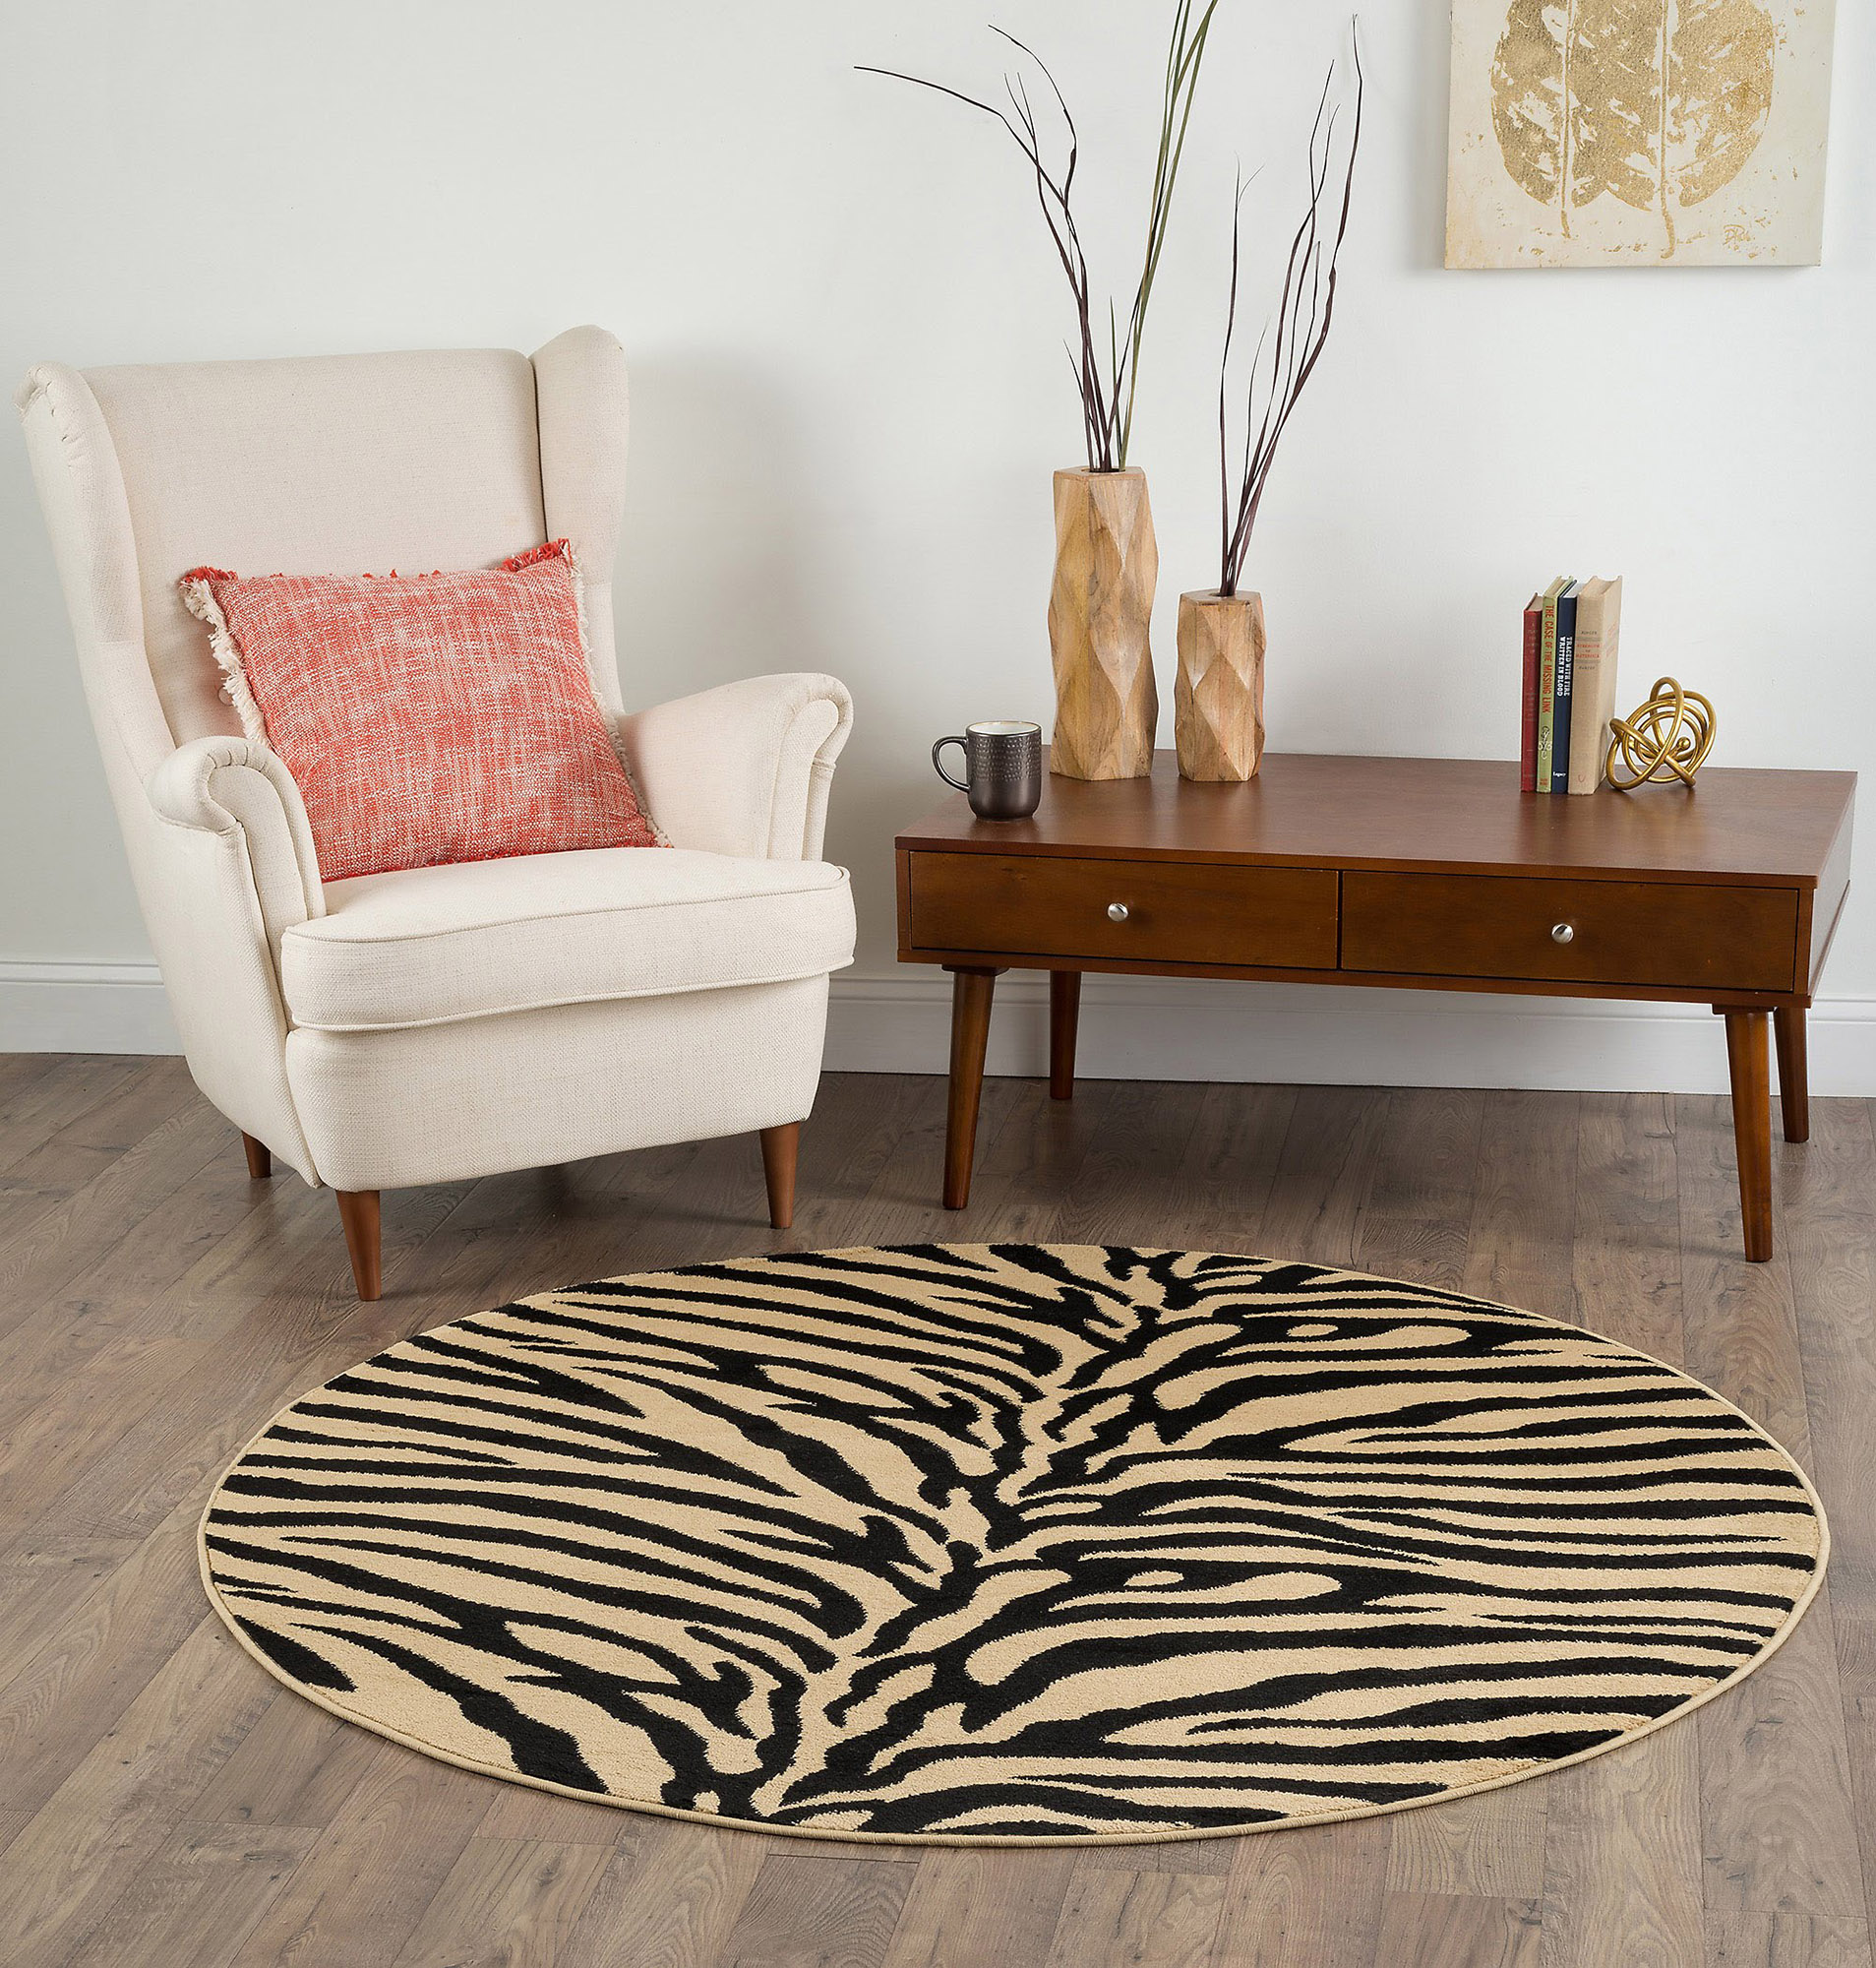 Modern Exotic Zebra Animal Print 8' Round Area Rug Safari